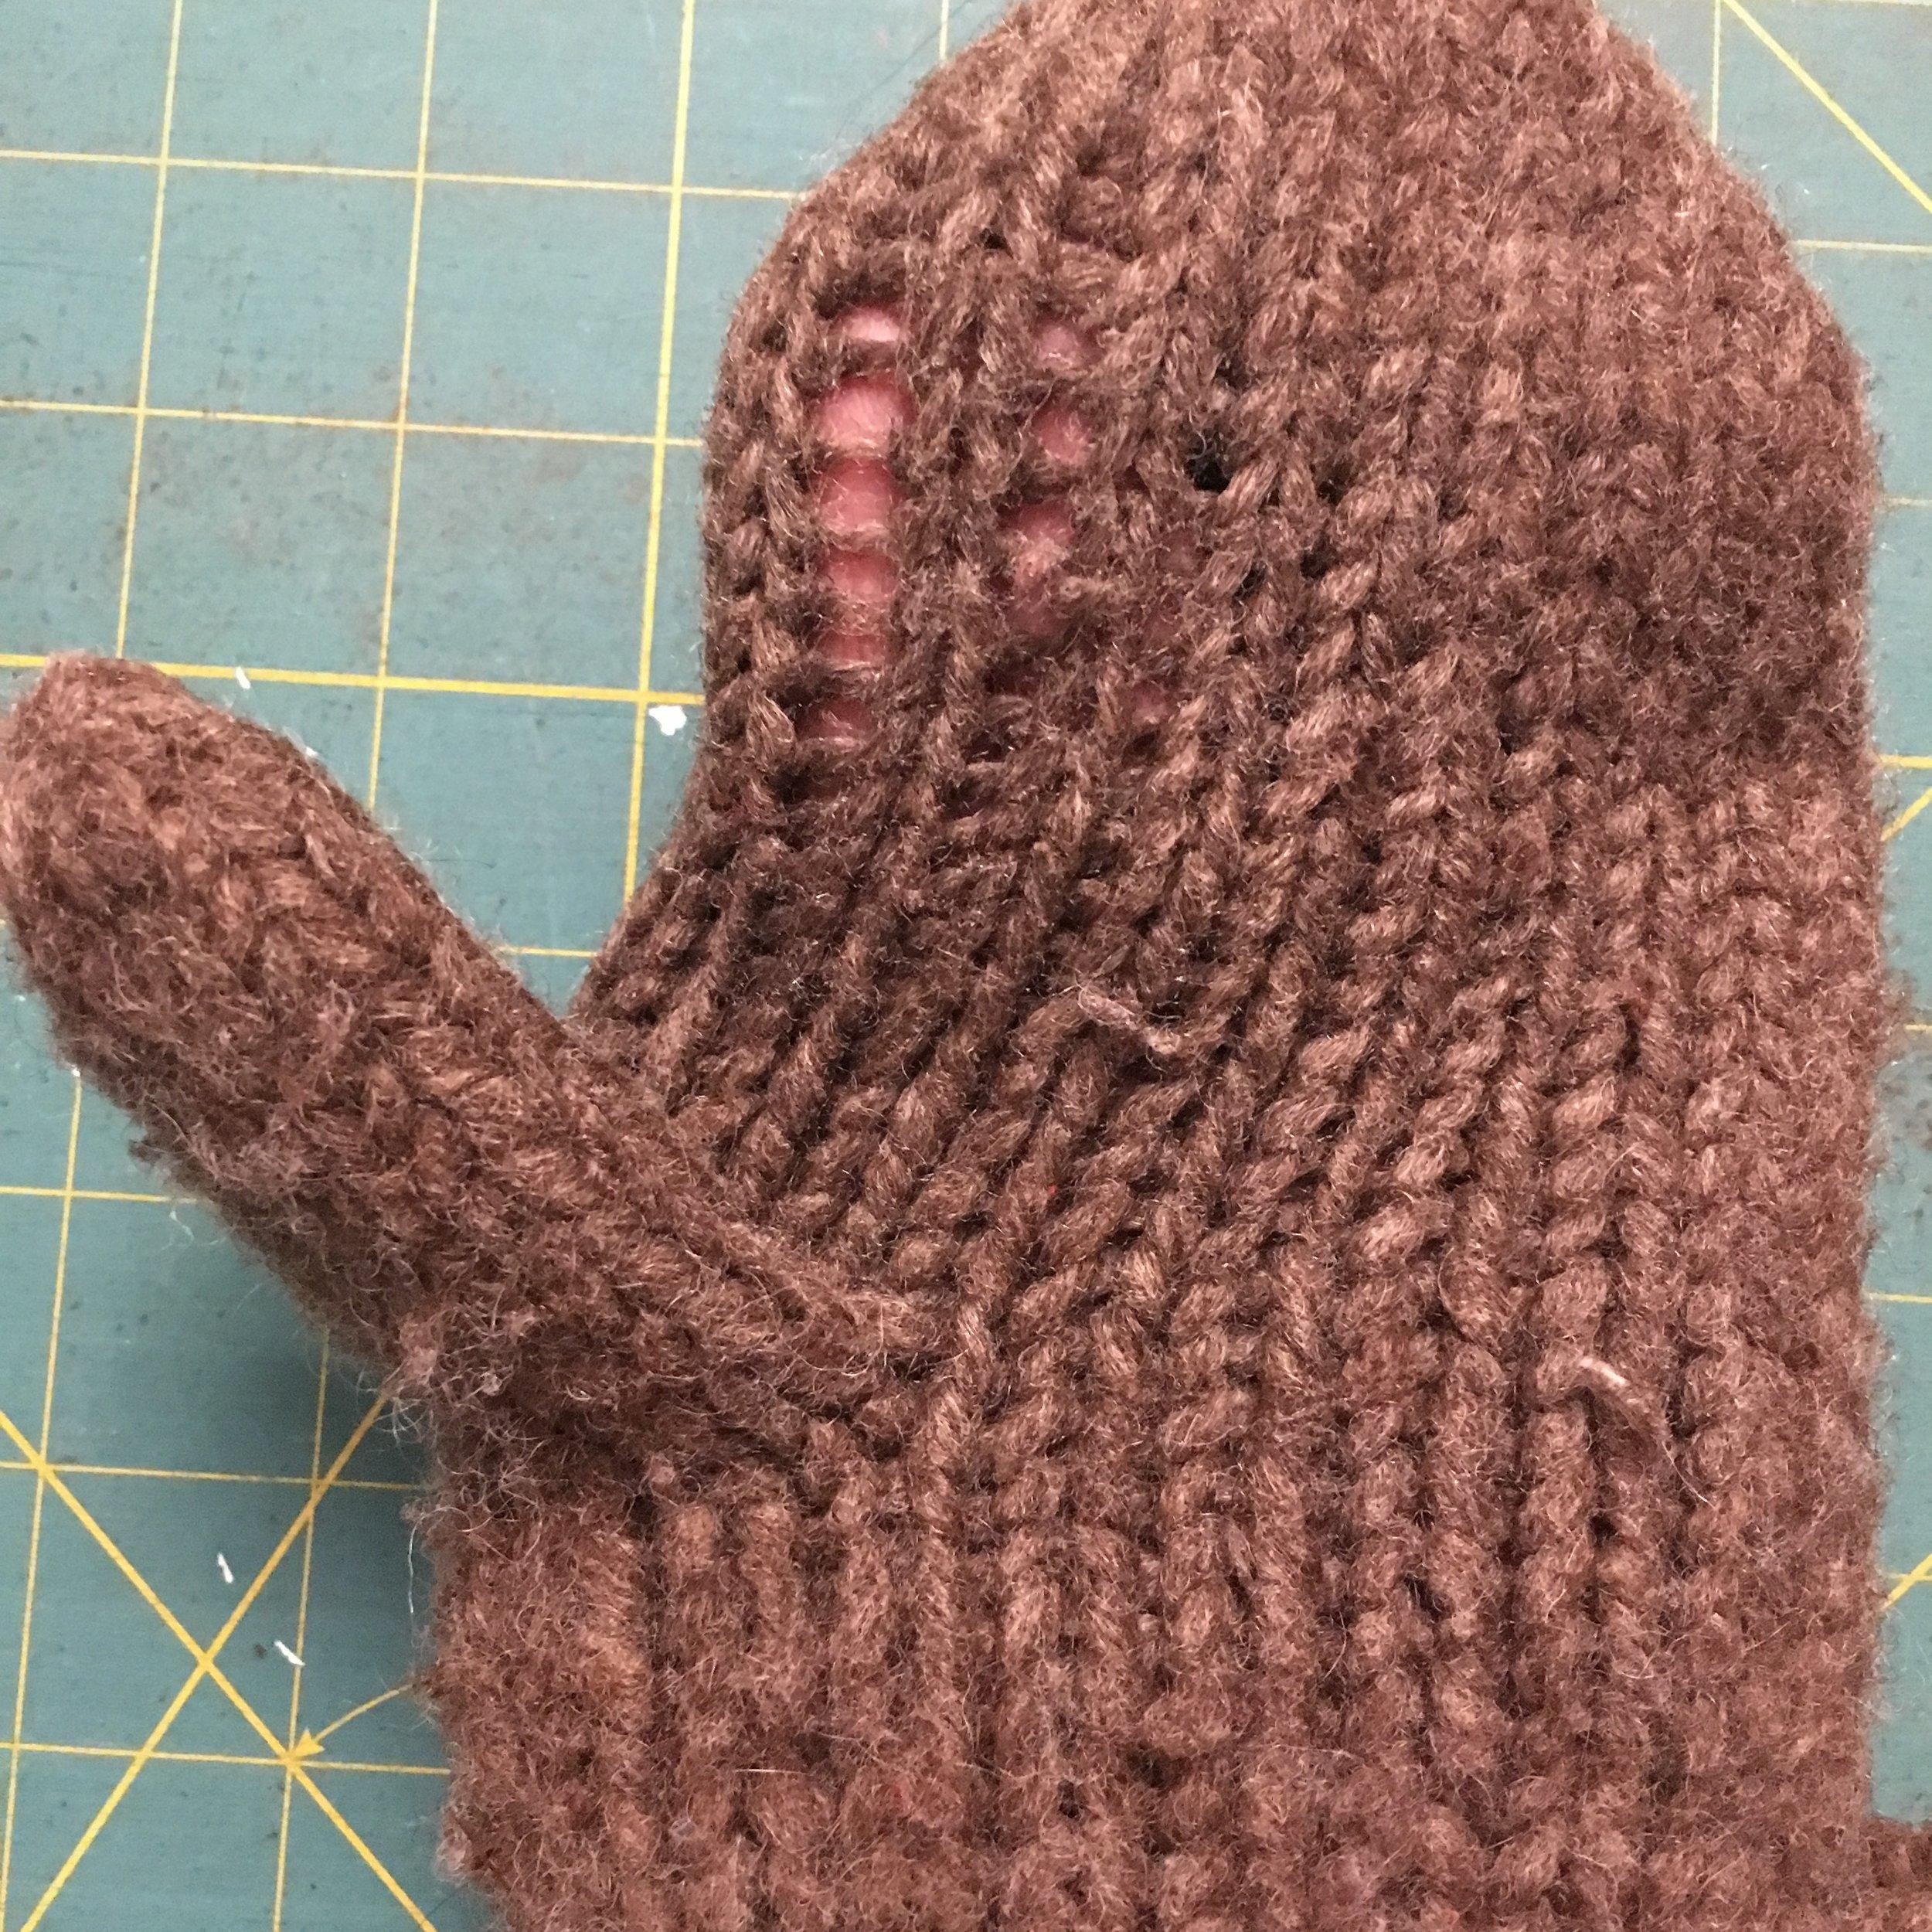 Thinning yarn on a mitten